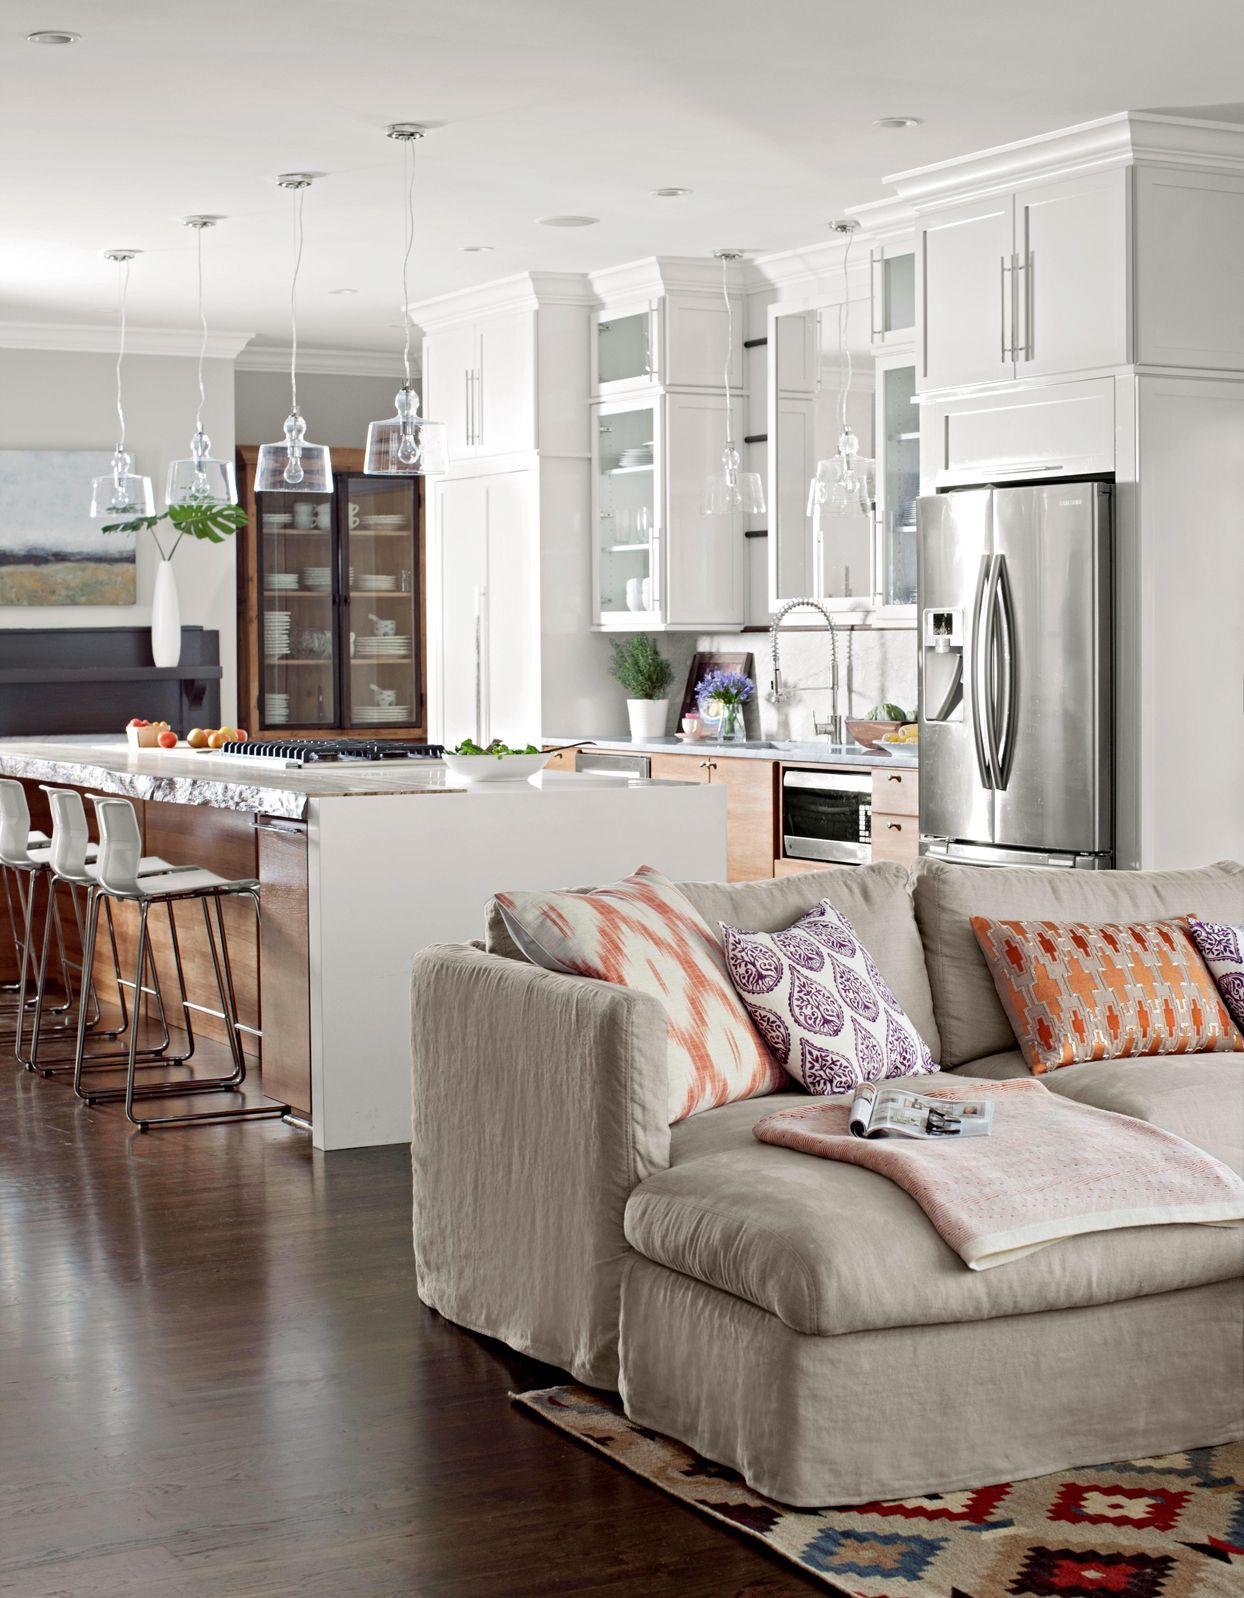 15 Distinctive Ideas For Living Rooms With Open Floor Plans Living Room Furniture Arrangement Living Room Floor Plans Open Kitchen And Living Room